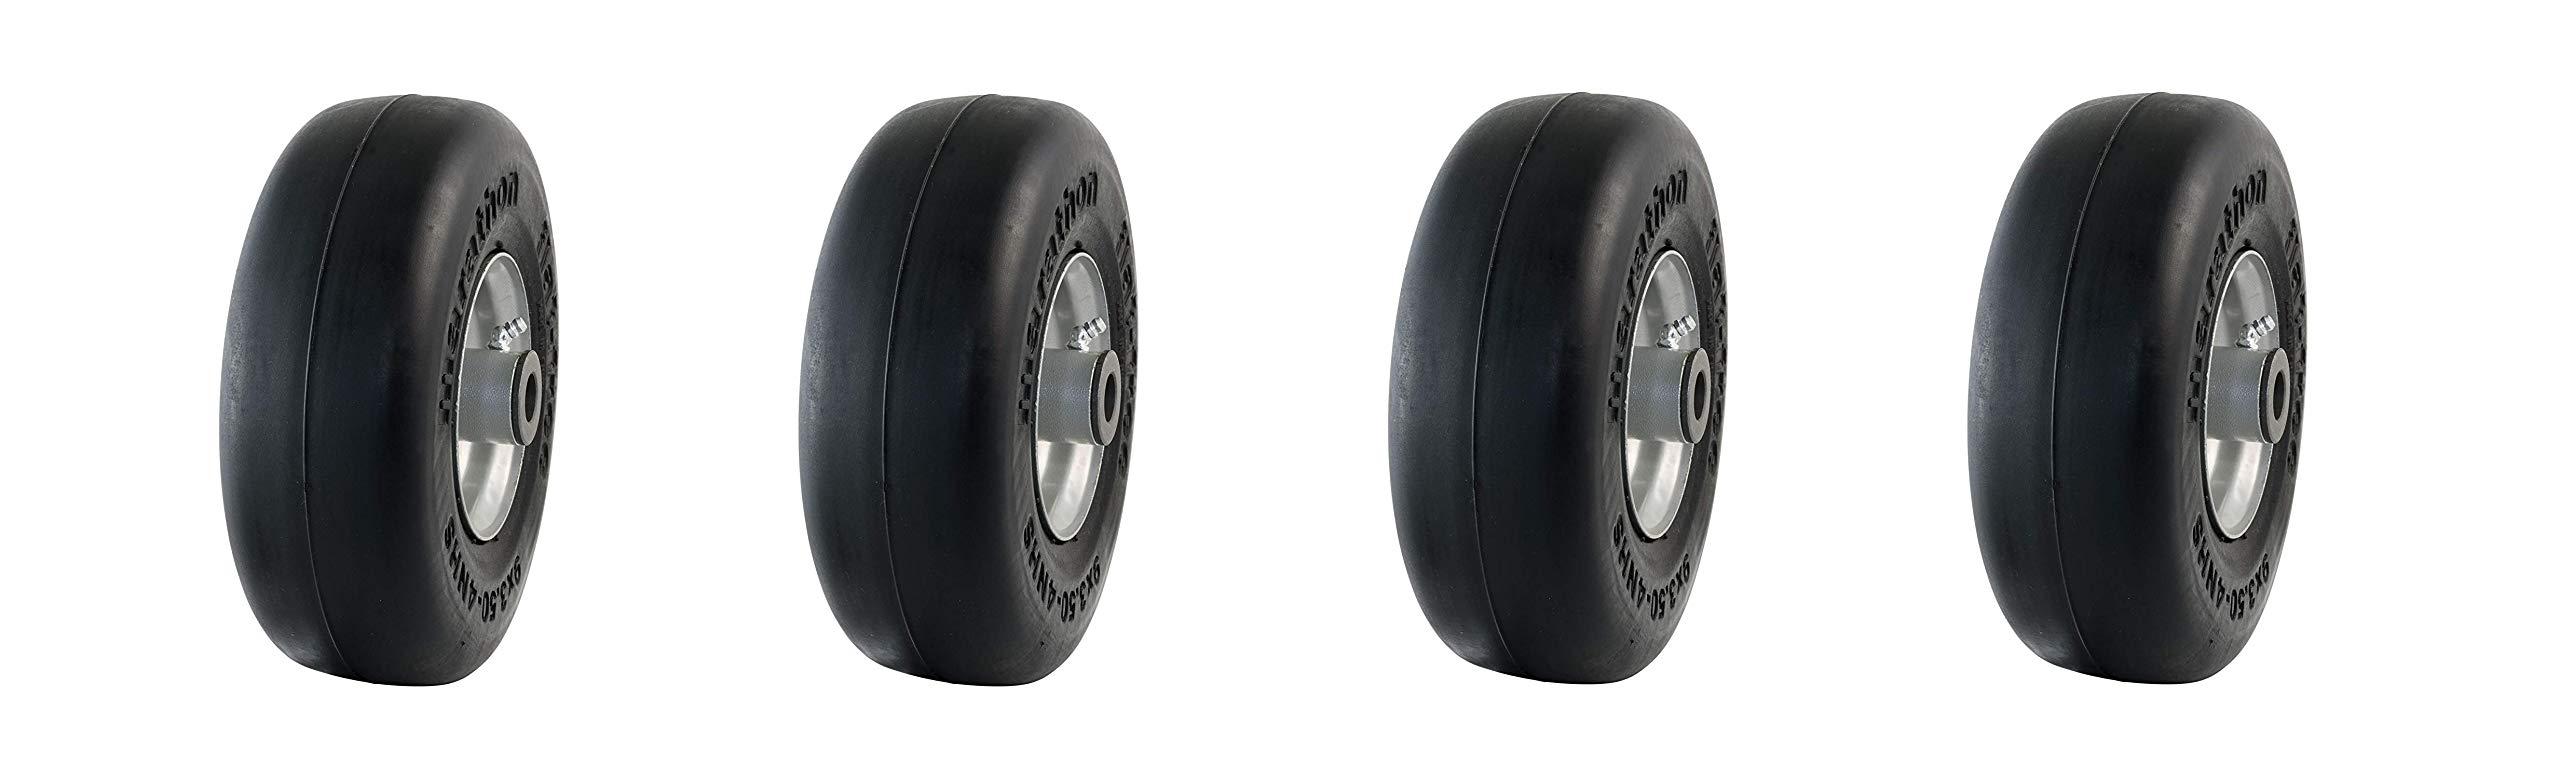 Marathon 9x3.50-4'' Flat Free Tire on Wheel, 4'' Centered Hub, 3/4'' Bushings (Pack of 4)